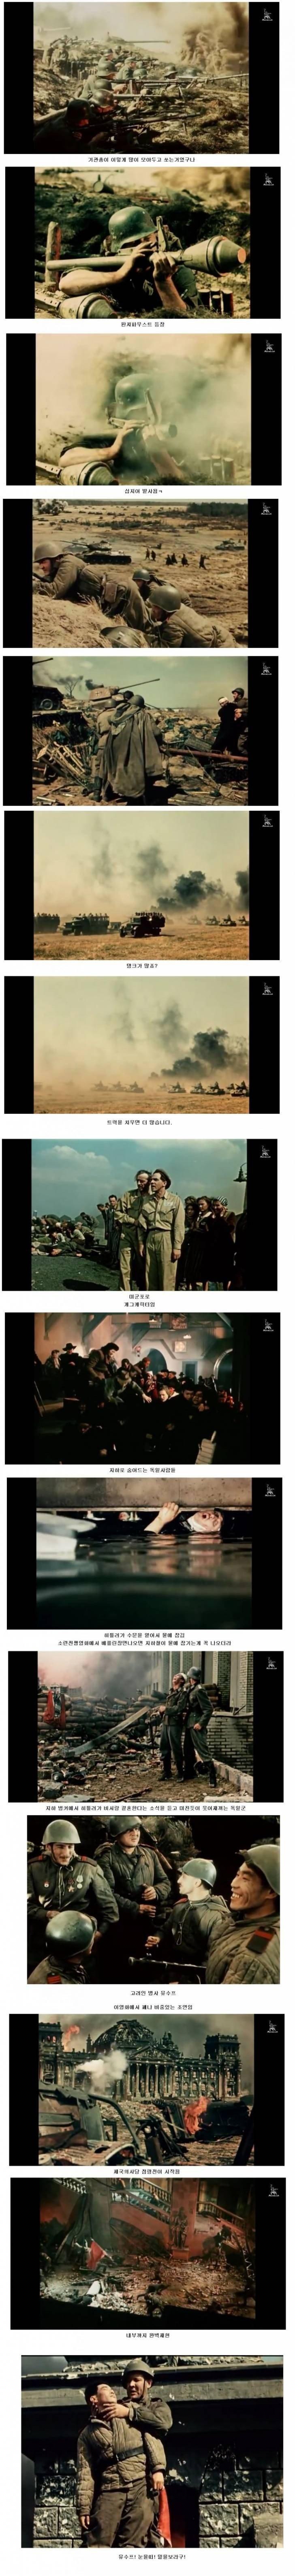 a_1364715478_86849379d2e5fdc21506f4e7019ec96e02fb5d2e (1).jpg 소련의 전쟁영화